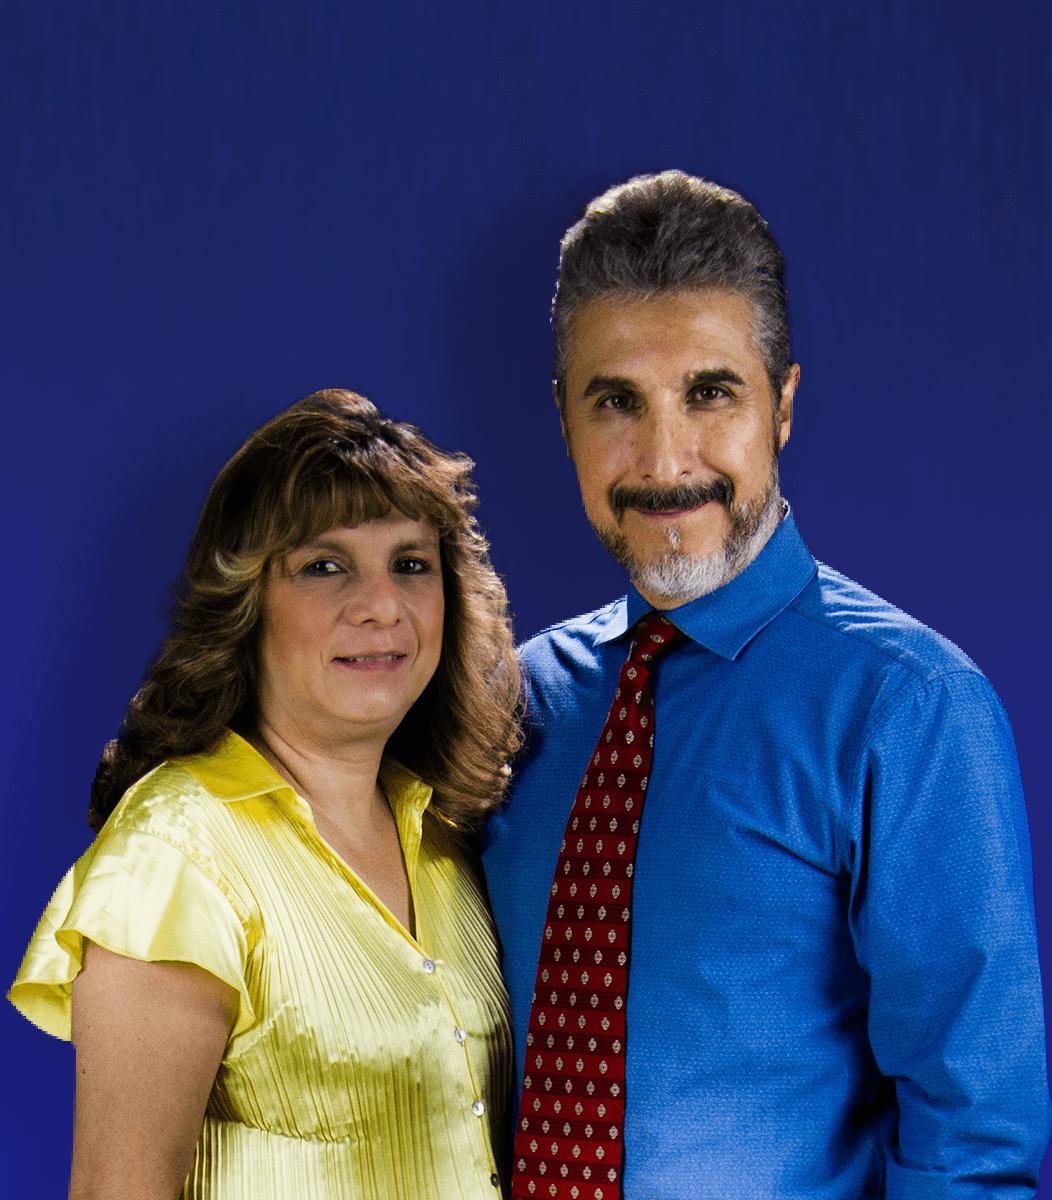 Alejandro Saavedra y Graciela Ceja   Centro de Vida Cristiana